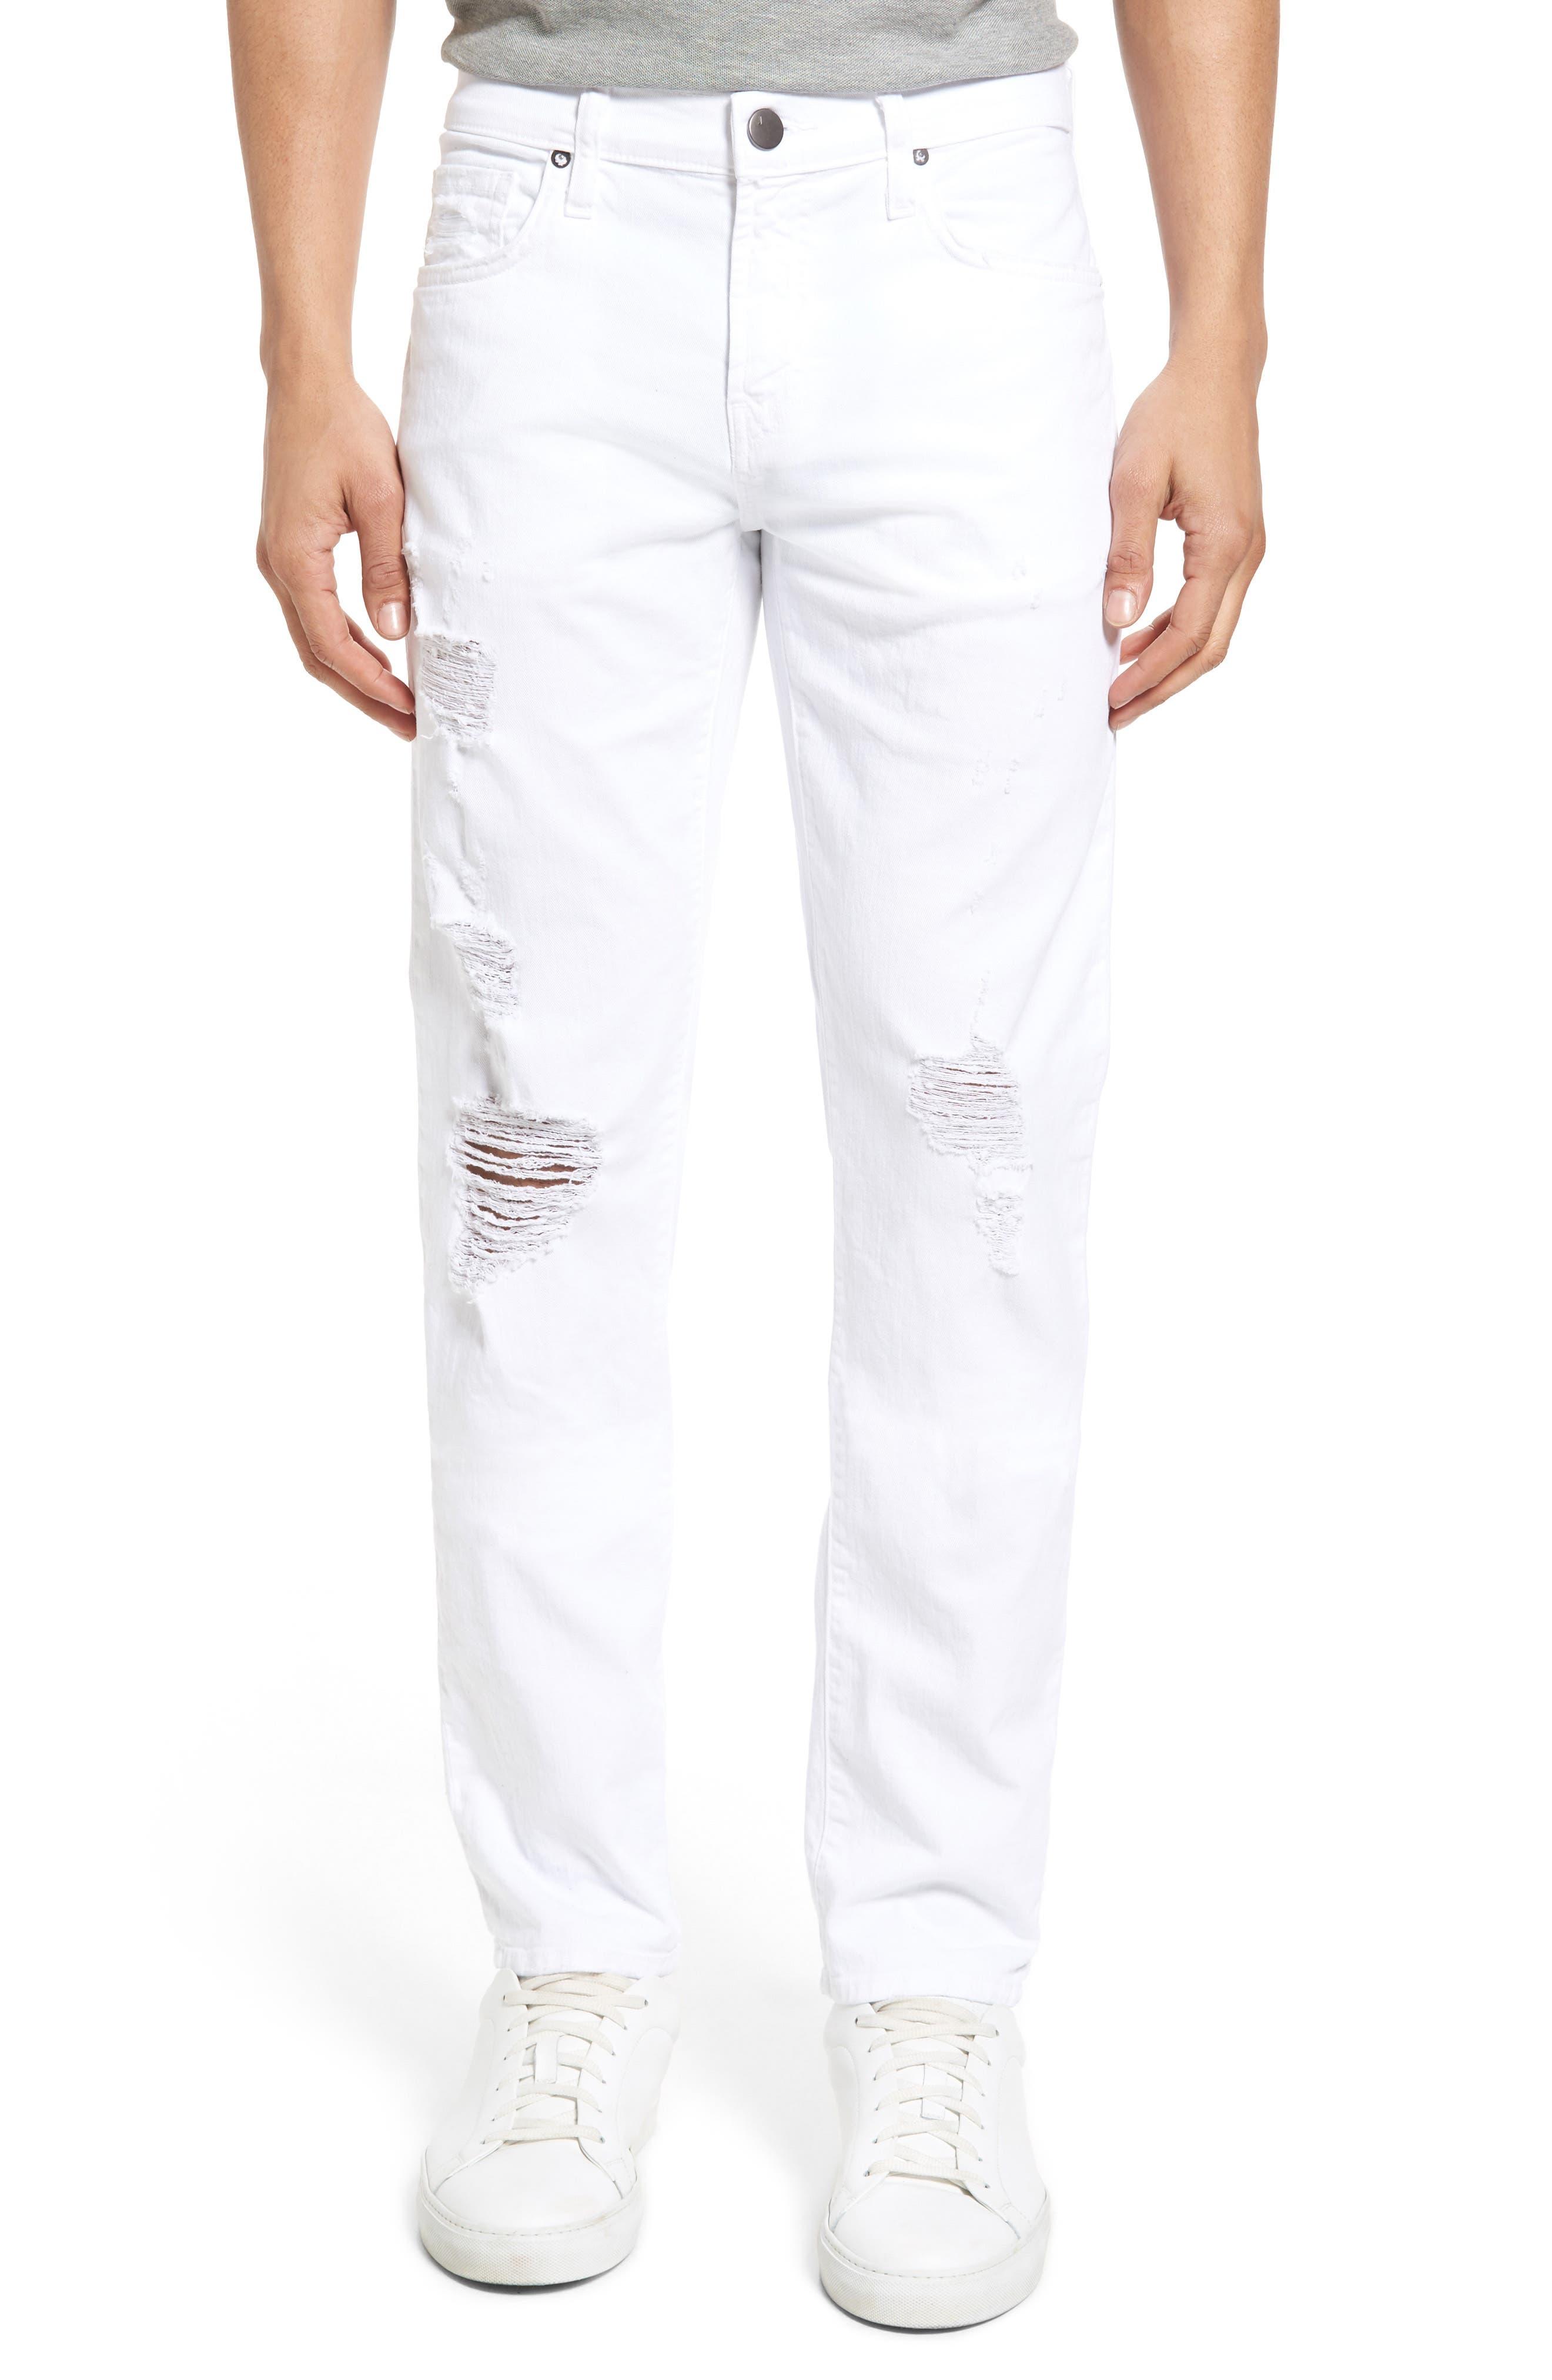 Main Image - J Brand Tyler Slim Fit Jeans (Destructed Theoros)